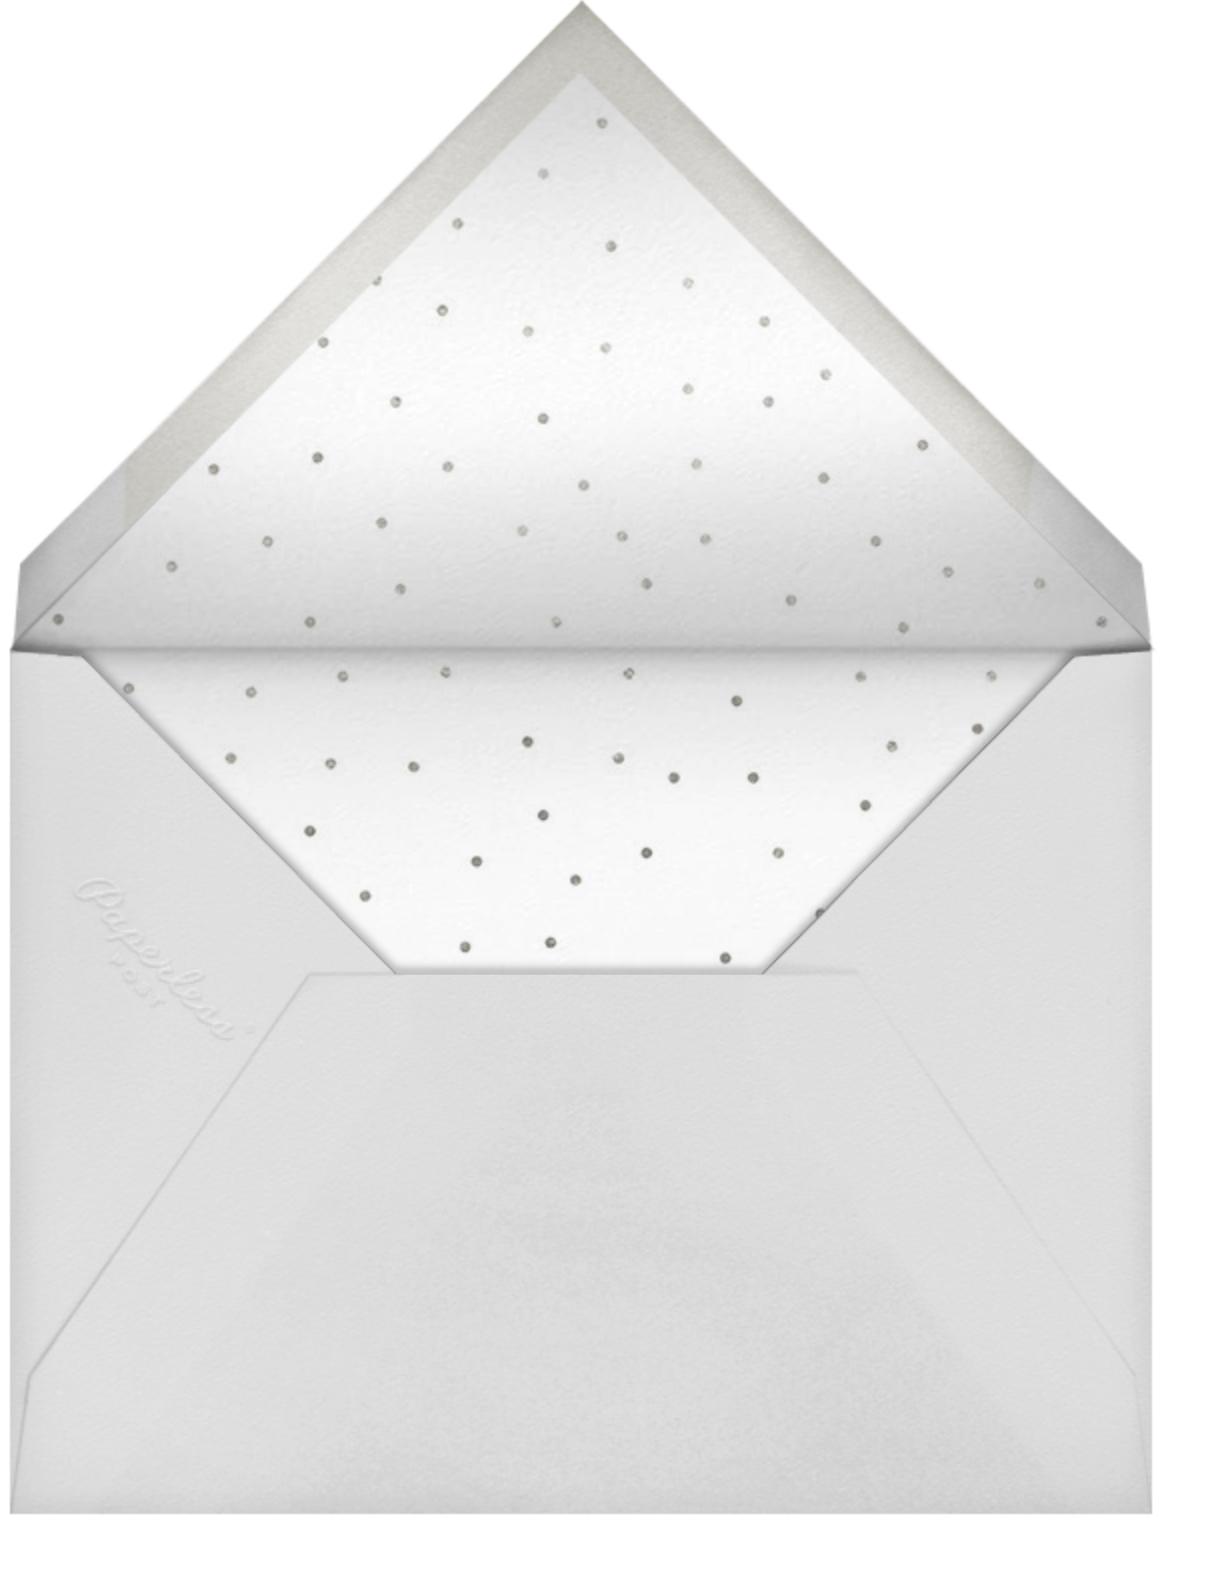 Firework - Navy - Paperless Post - Envelope